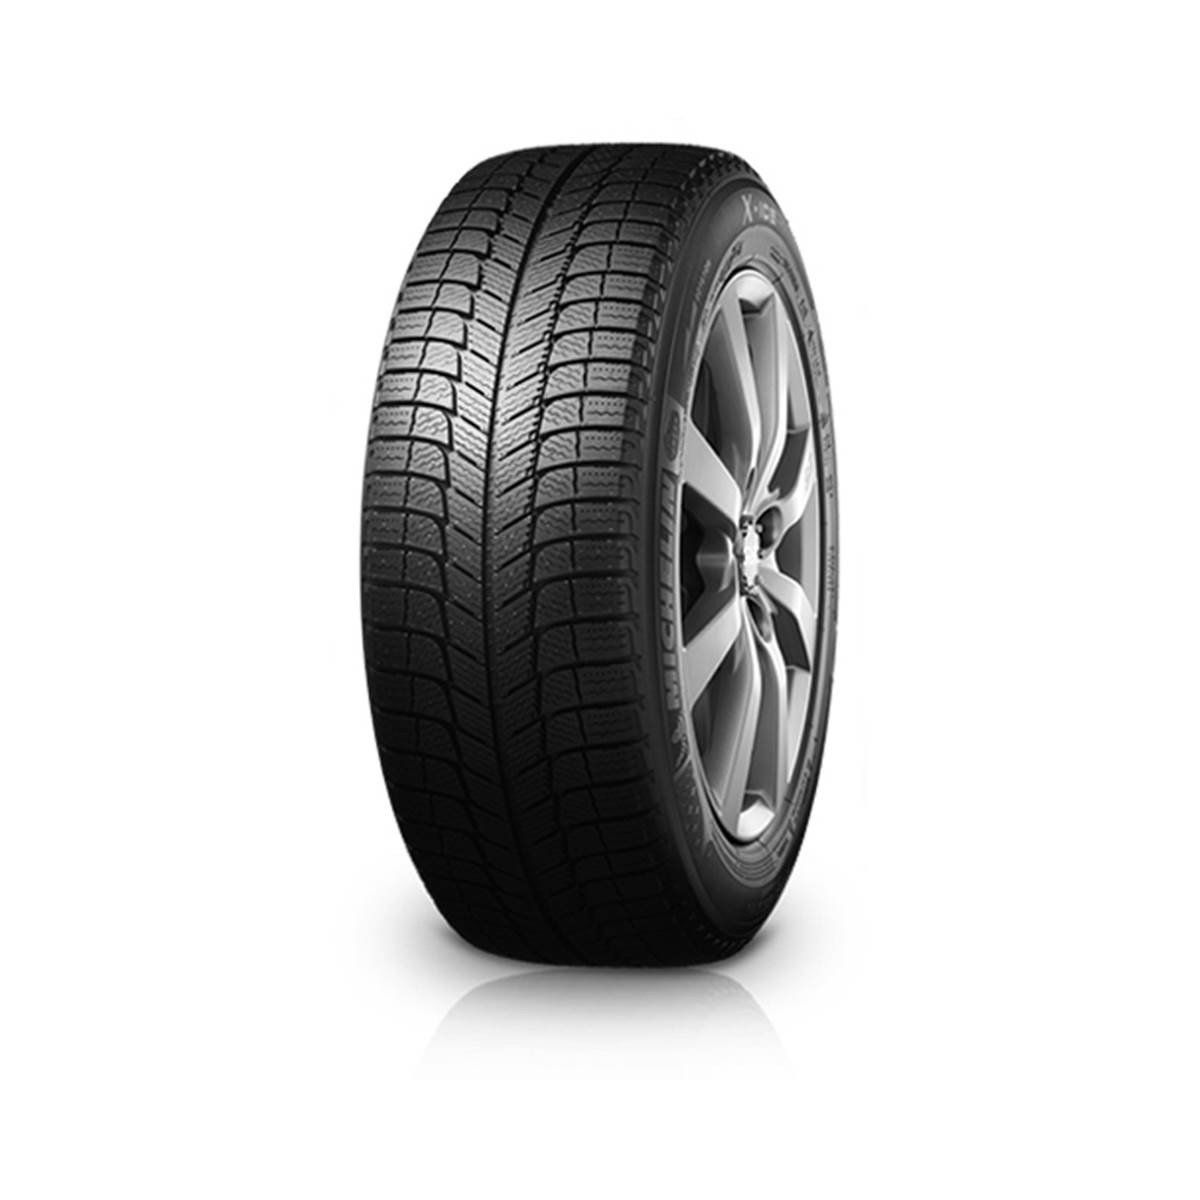 Comparer les prix des pneus Michelin X-ICE